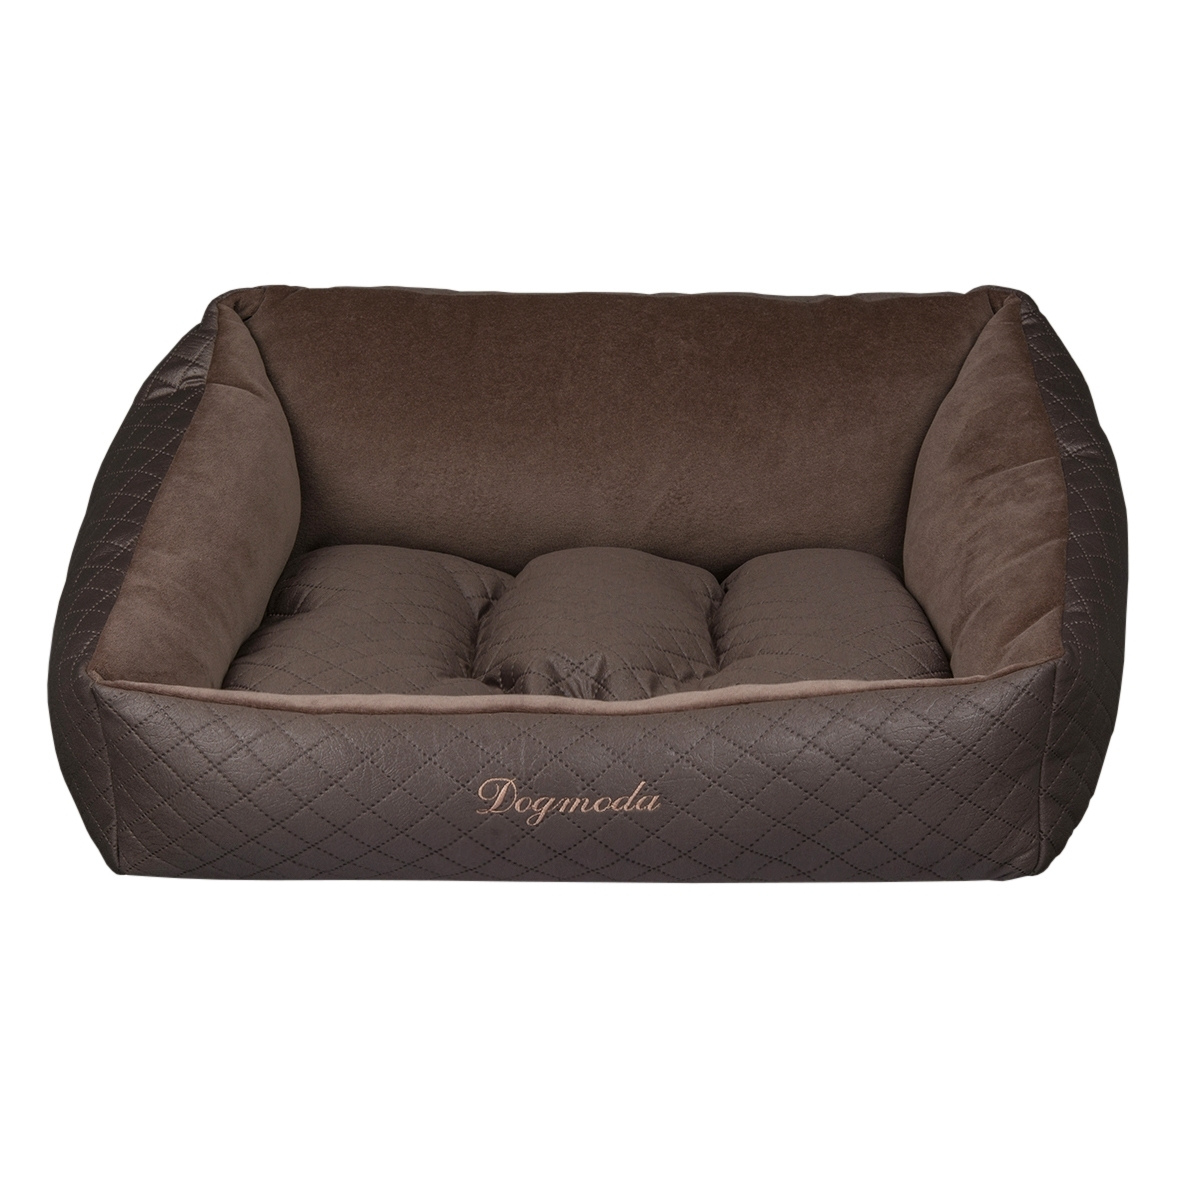 Лежак для животных Dogmoda Шоколад, 61 х 61 х 21 см лежаки для животных dogmoda лежак милан 54x47x16